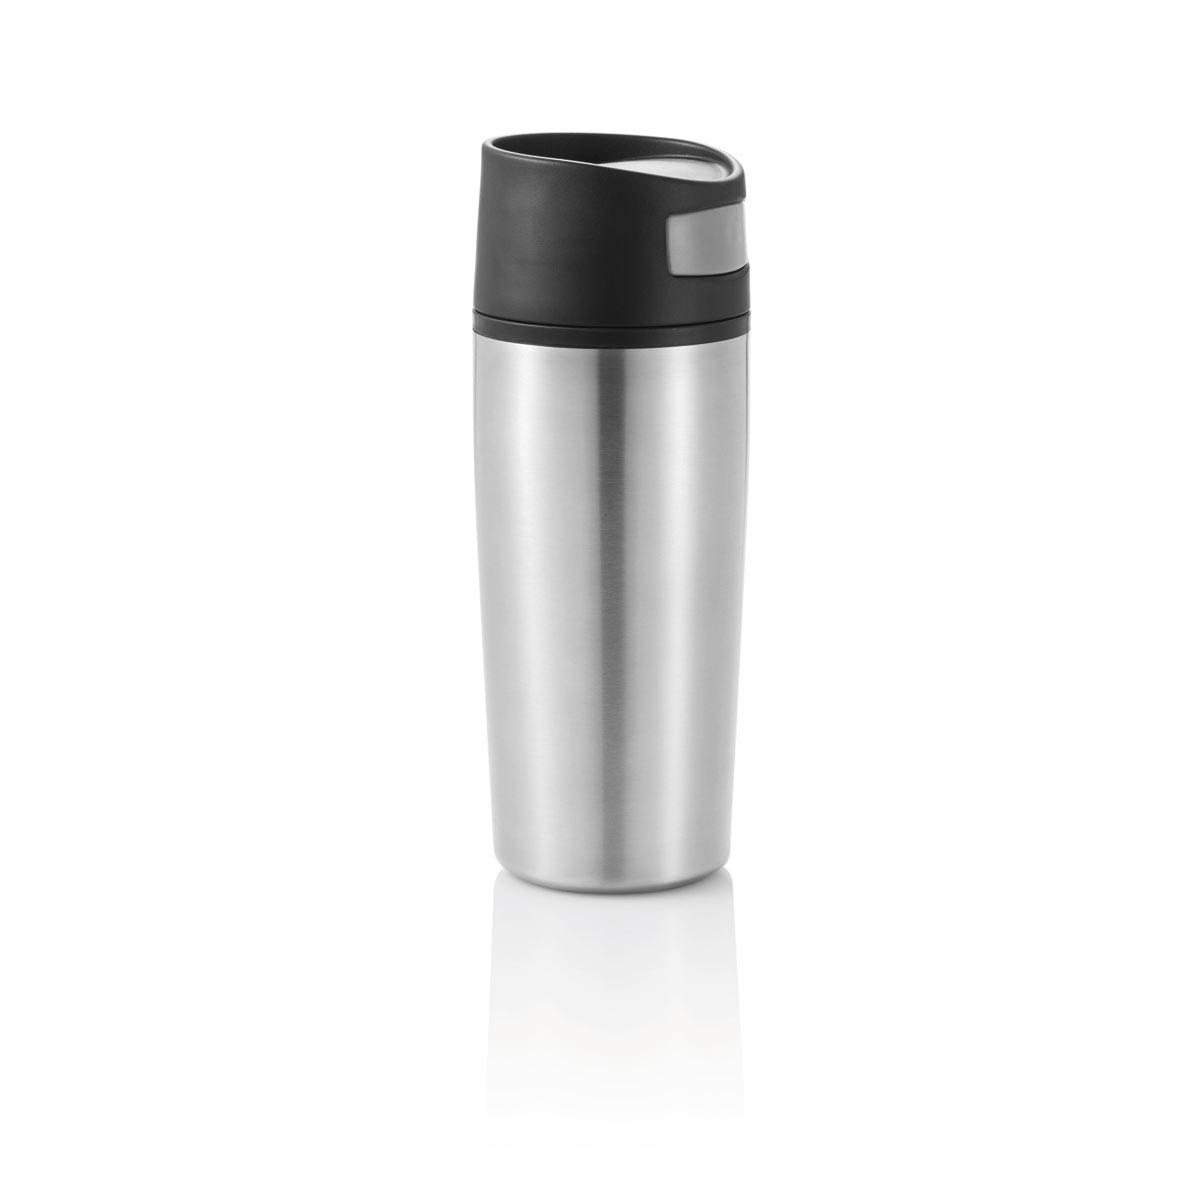 Mug Thermo Publicitaire - Mug Inox - Bouteille